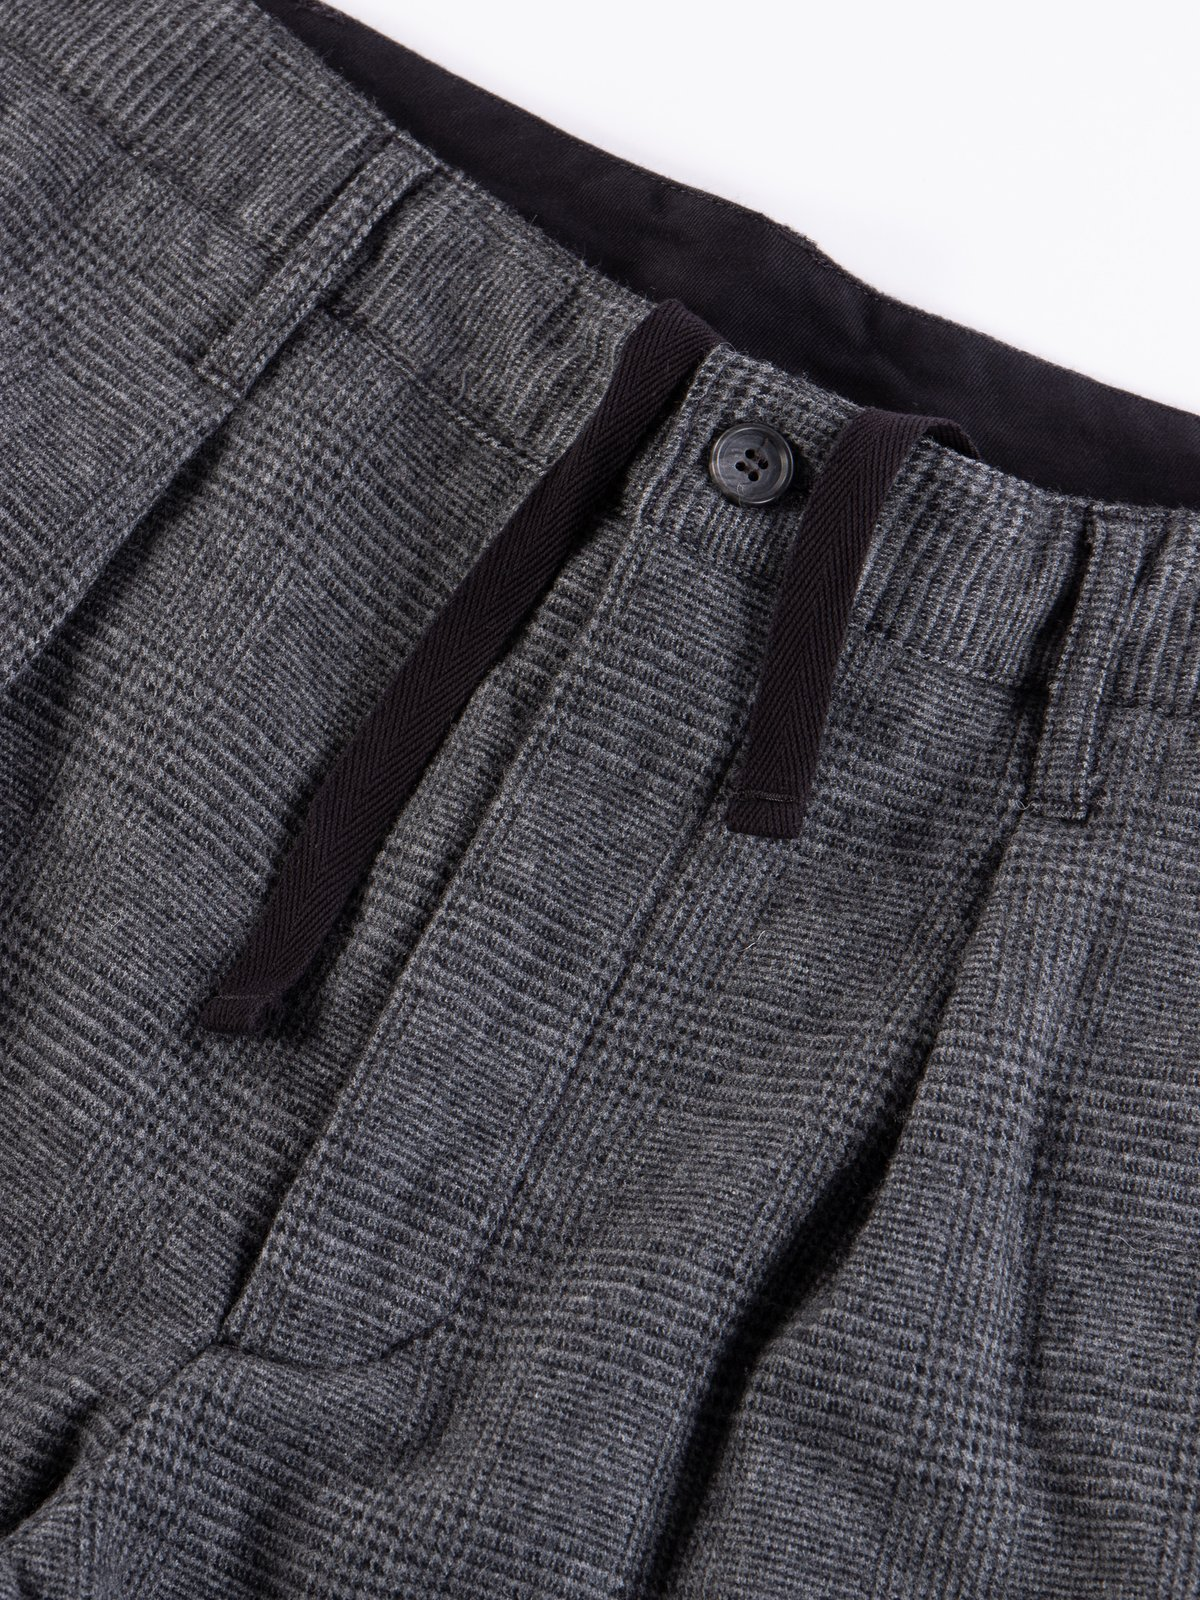 Grey Wool Glen Plaid Stripe Carlyle Pant - Image 4